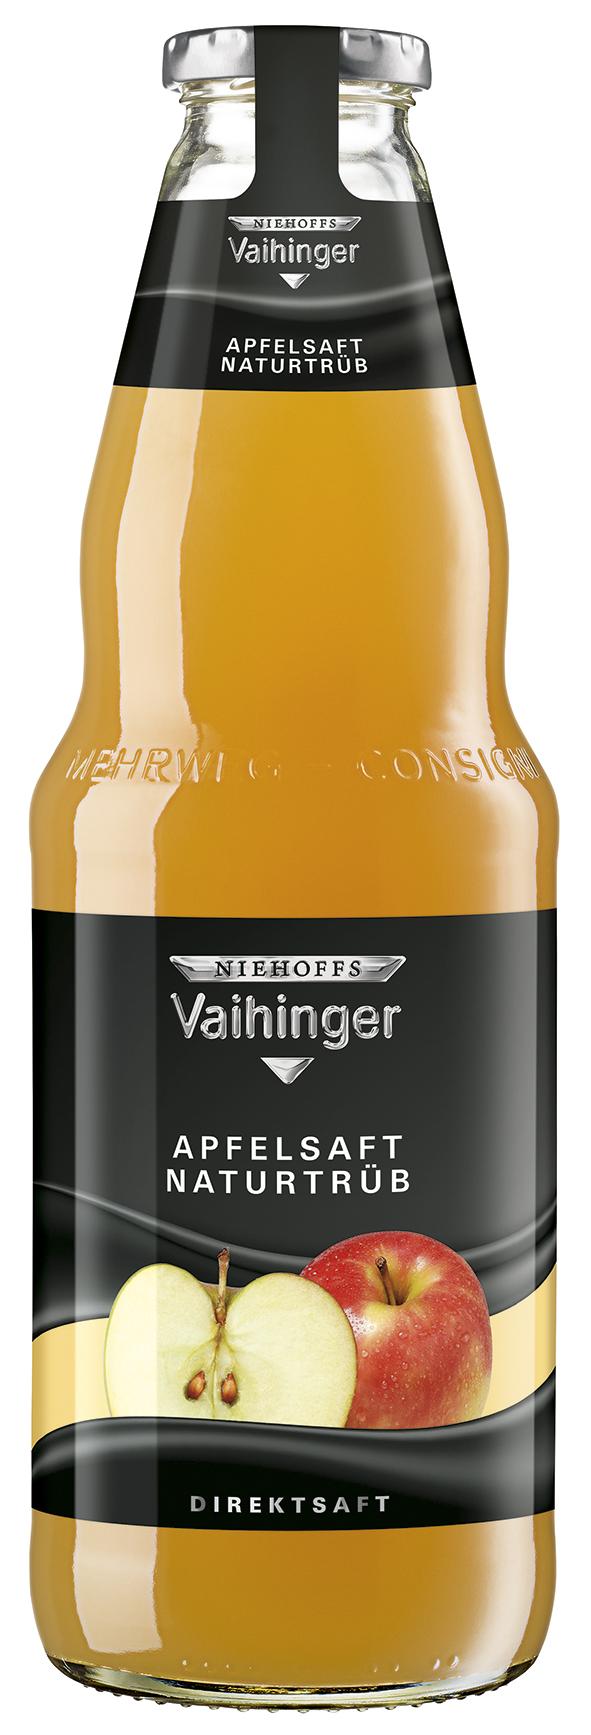 Vaihinger Apfelsaft naturtrüb (Direktsaft)